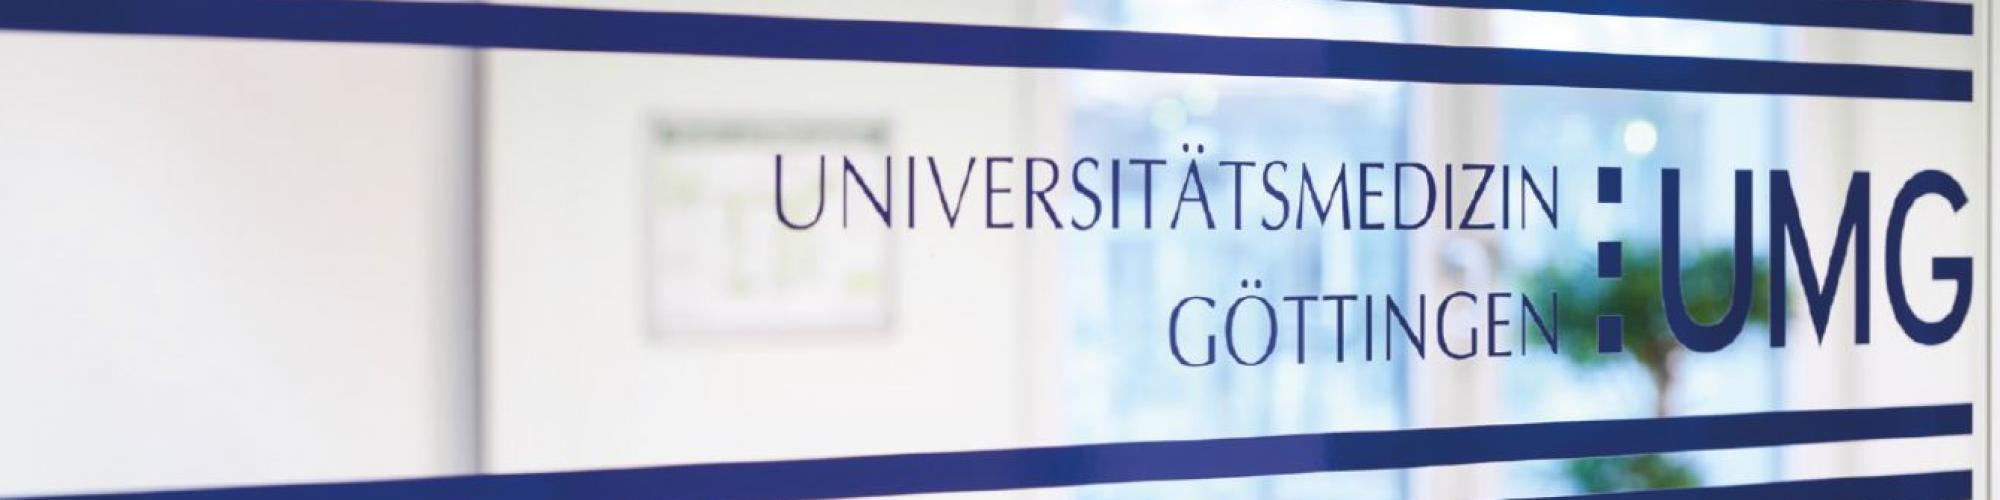 Universitätsmedizin Göttingen | UMG